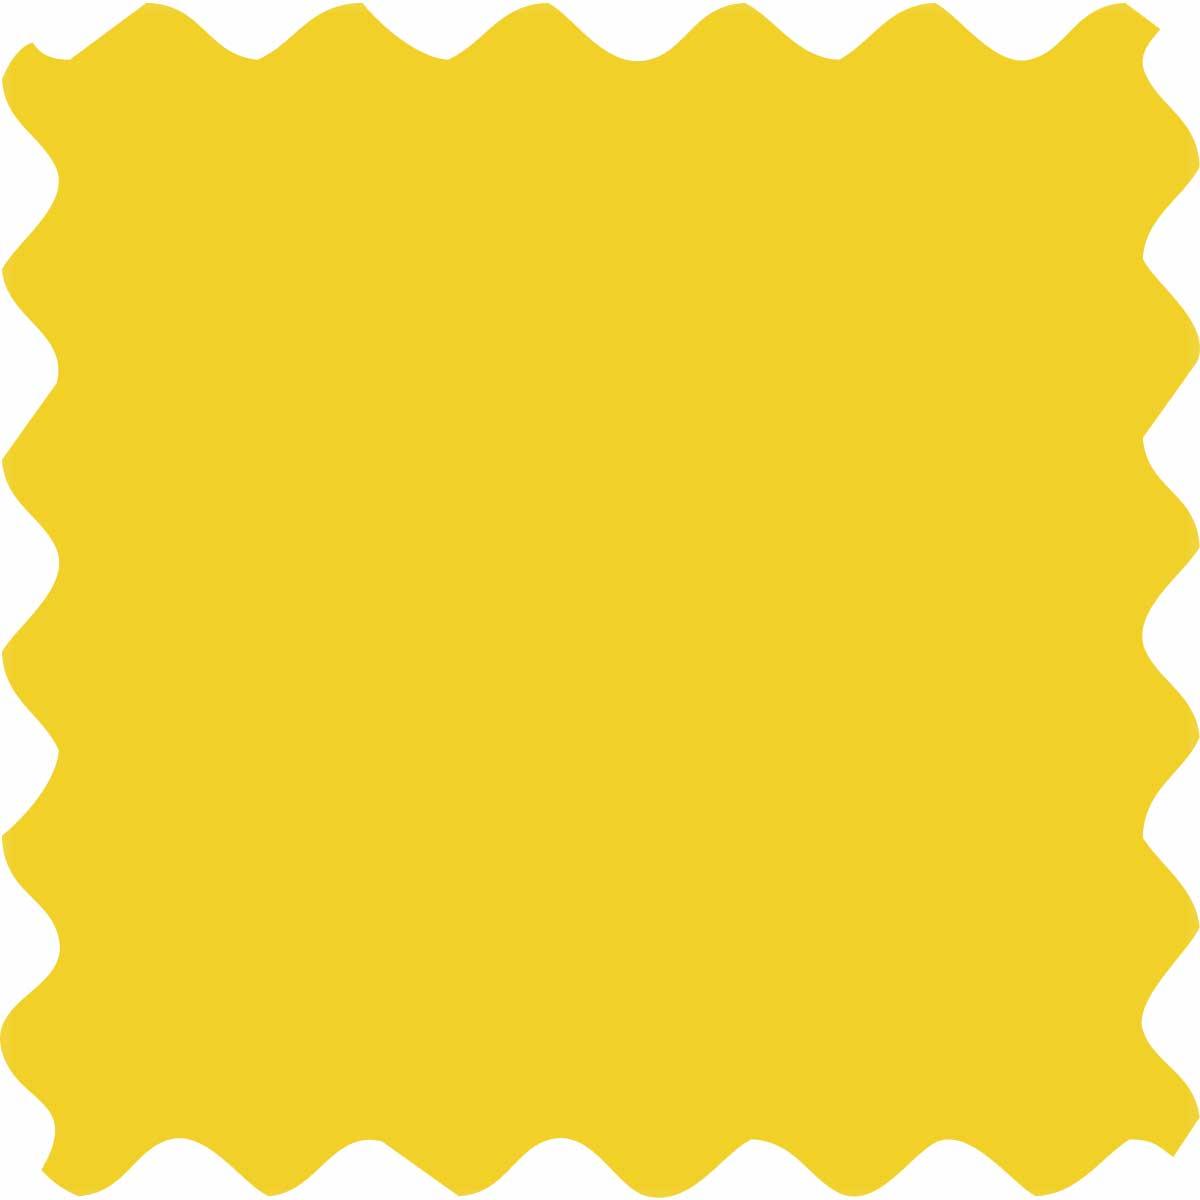 Fabric Creations™ Plush™ 3-D Fabric Paints - Lemonade, 2 oz.